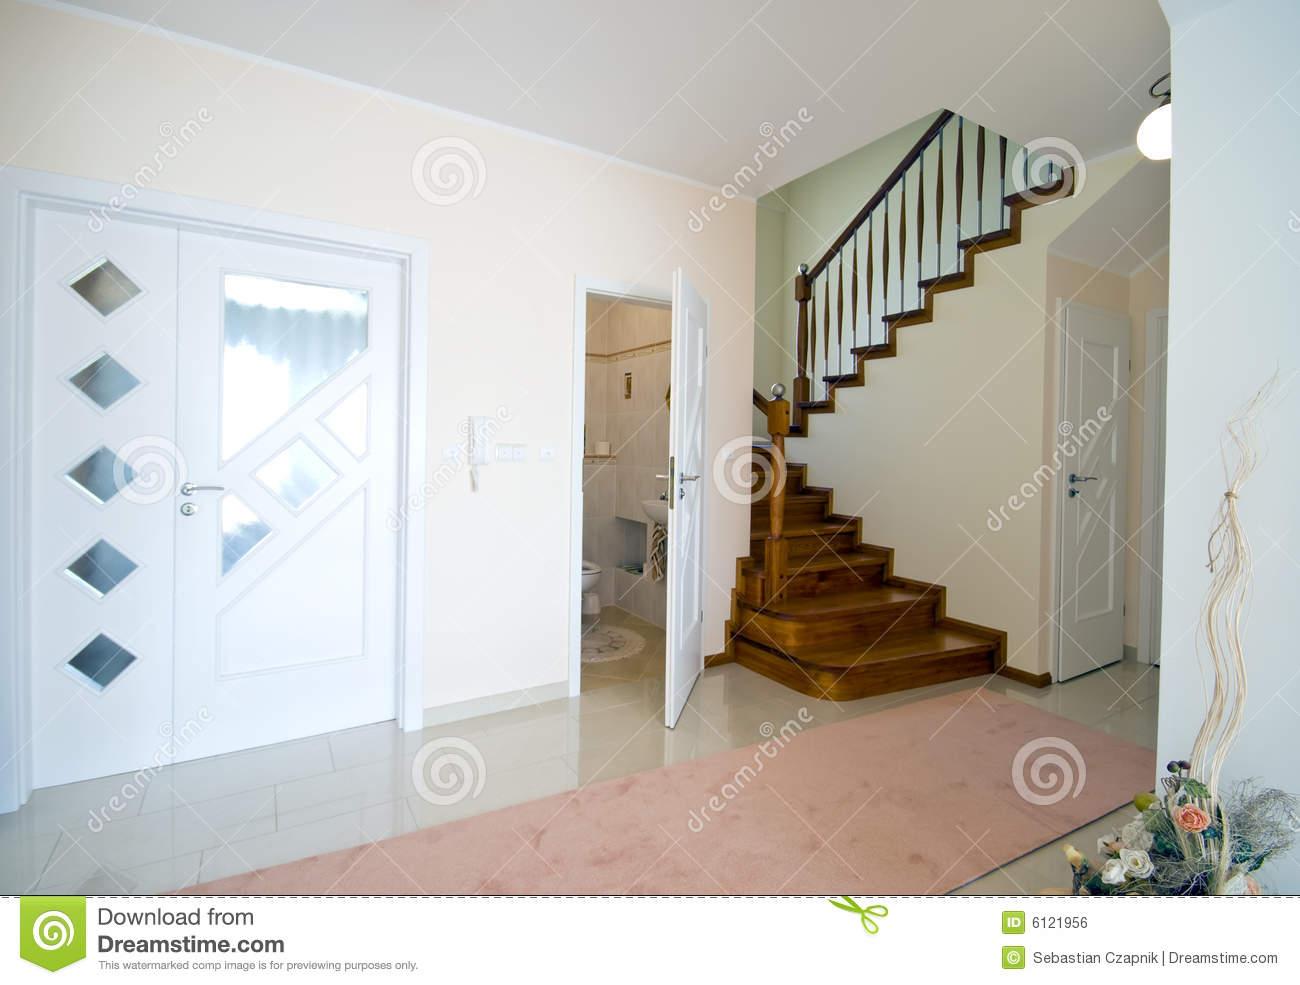 Porte De Maison Moderne Portes Intrieures Modernes Pour